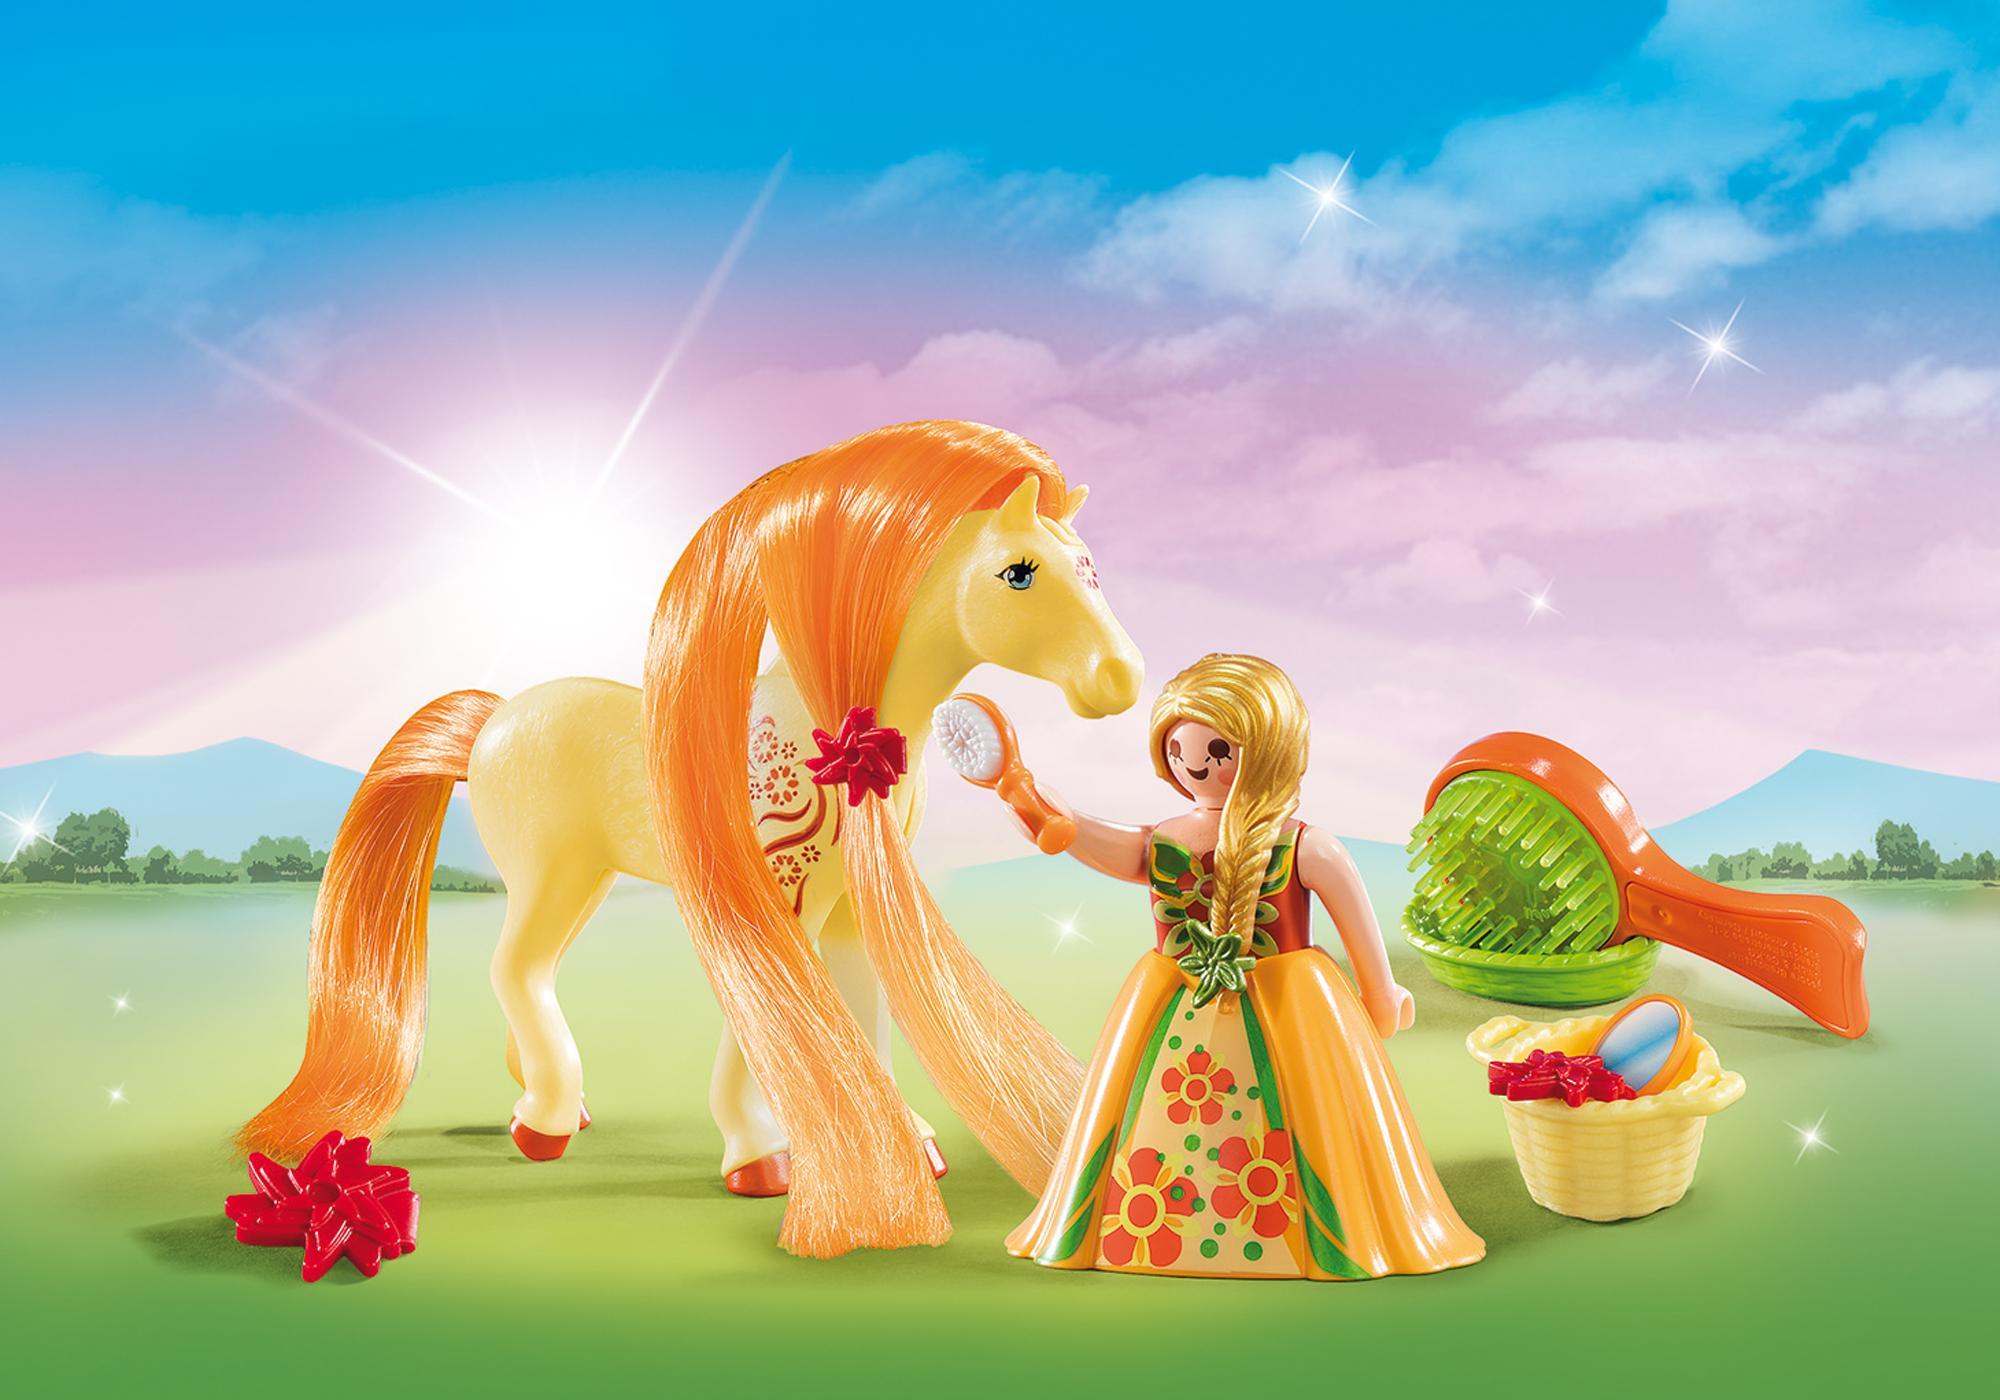 http://media.playmobil.com/i/playmobil/5656_product_detail/Maletín grande 'Princesa con caballo'